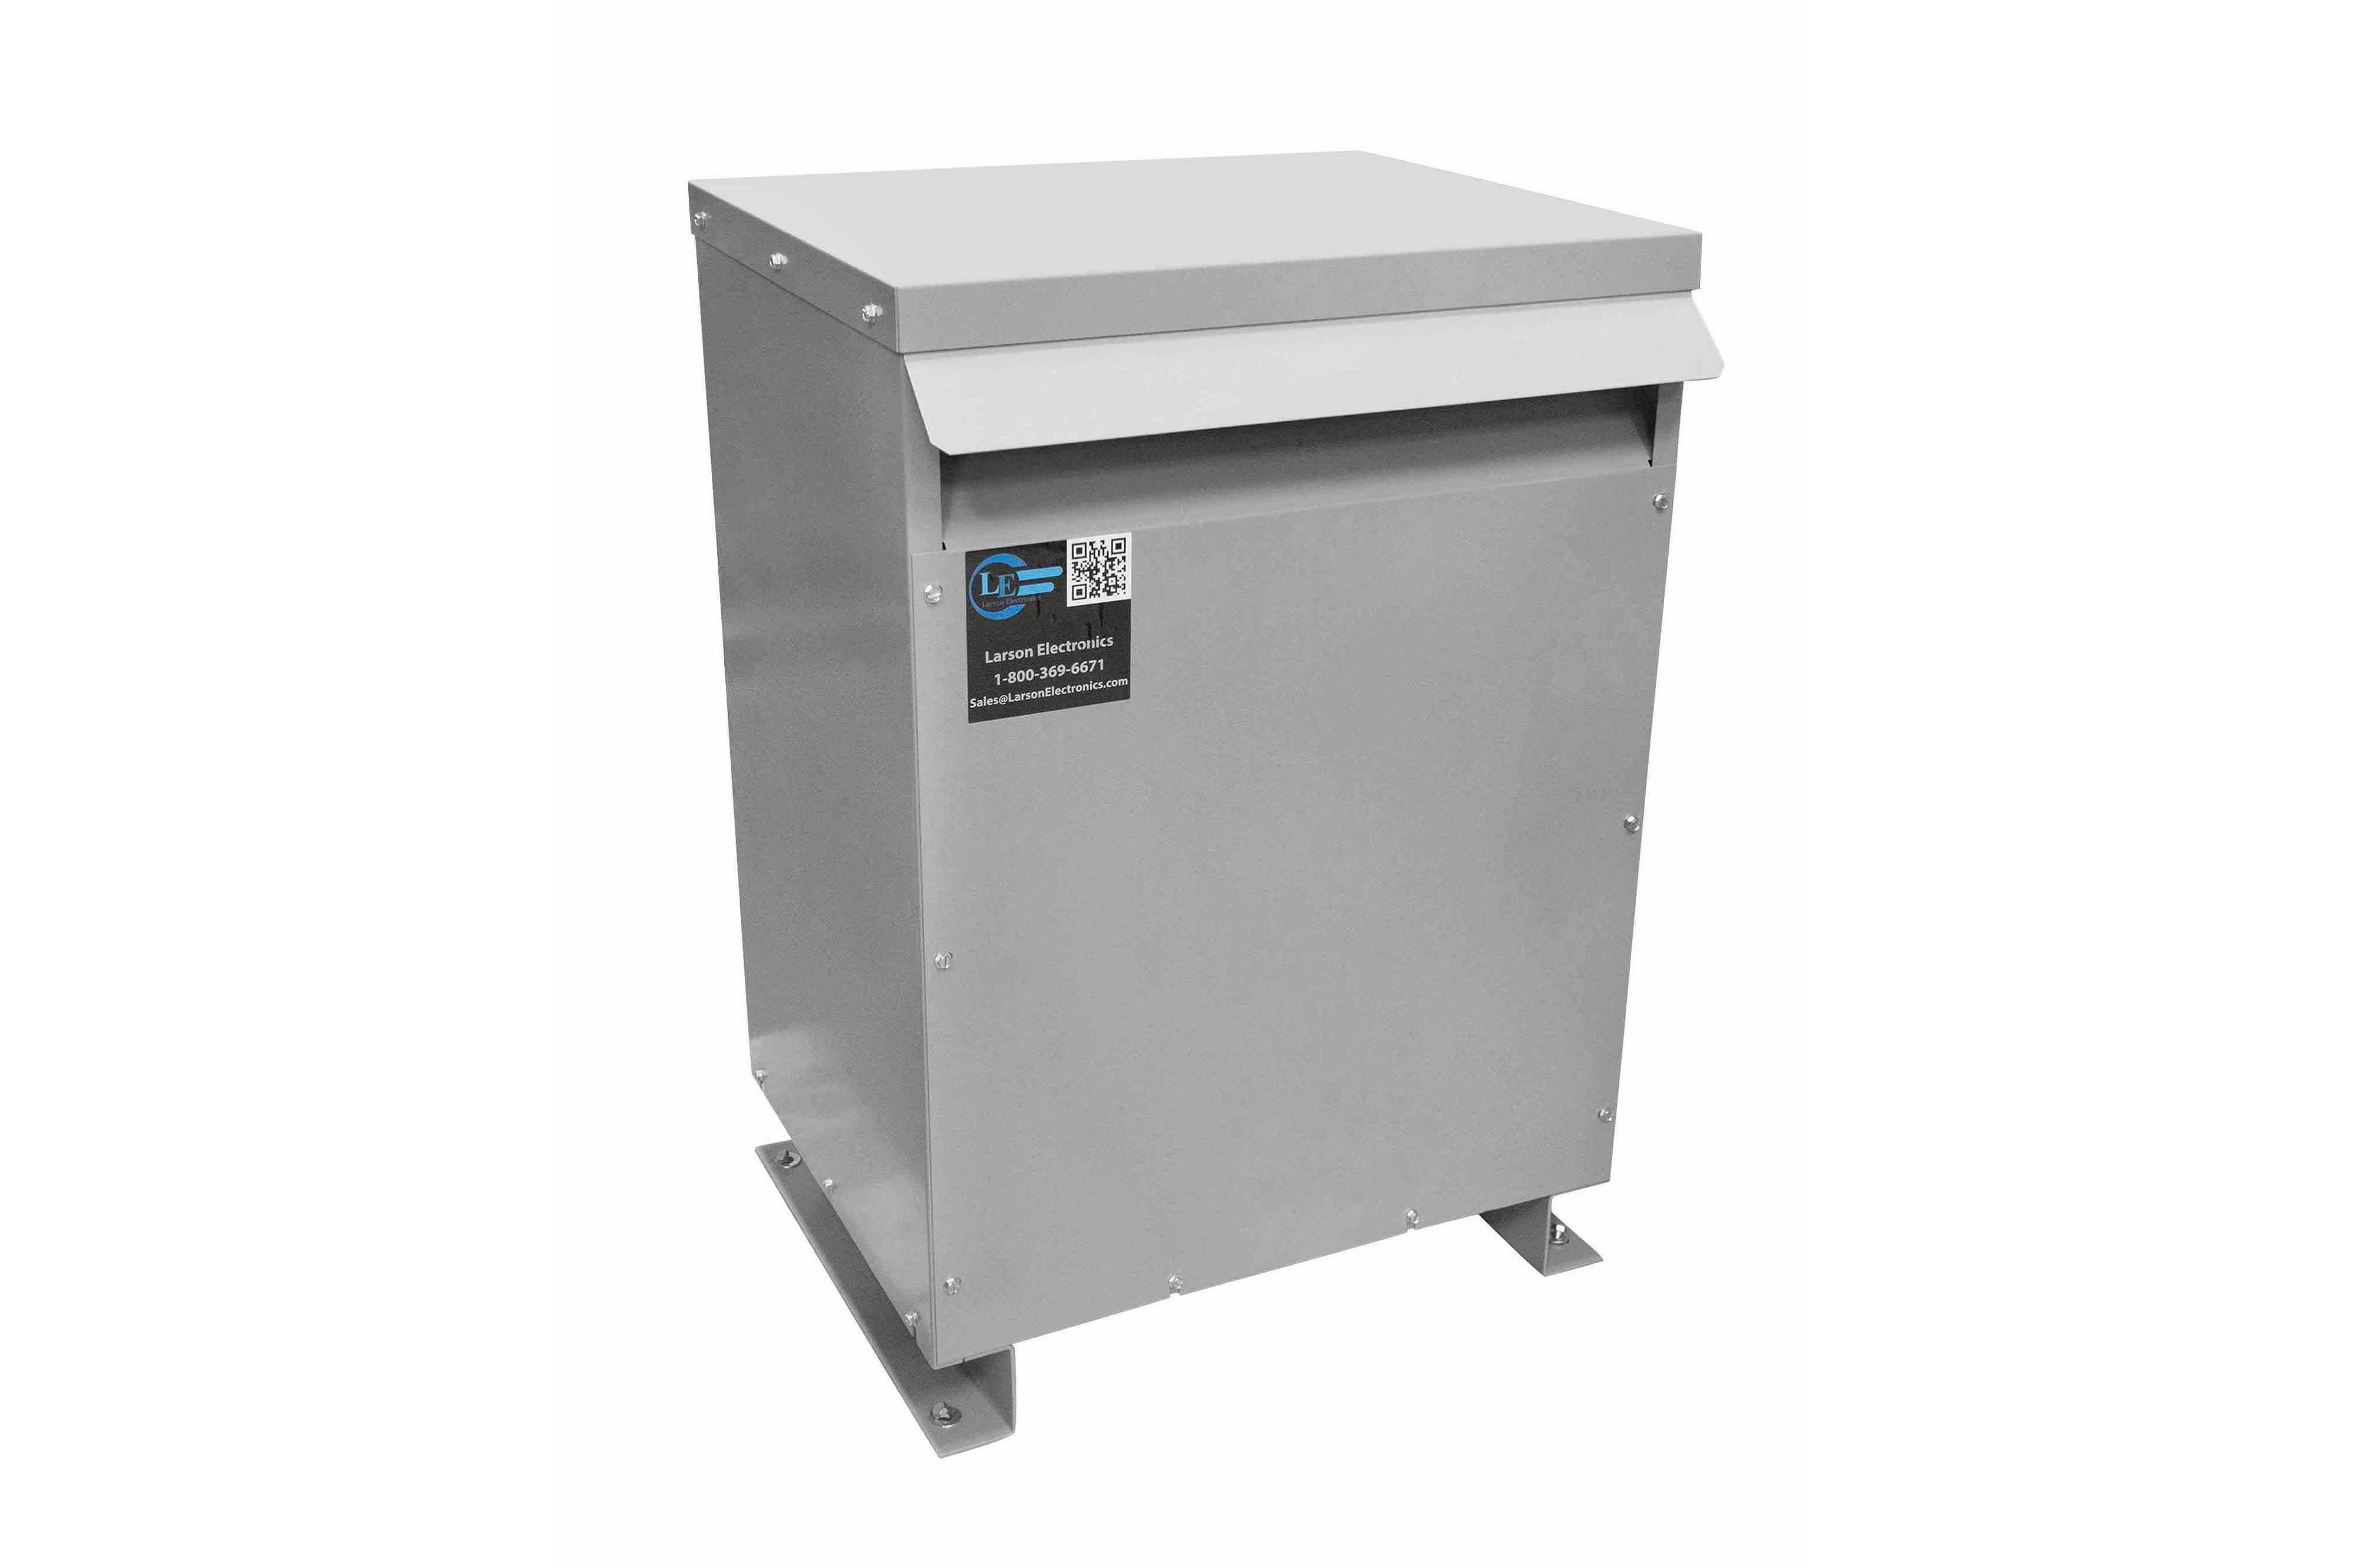 137.5 kVA 3PH Isolation Transformer, 460V Wye Primary, 208V Delta Secondary, N3R, Ventilated, 60 Hz